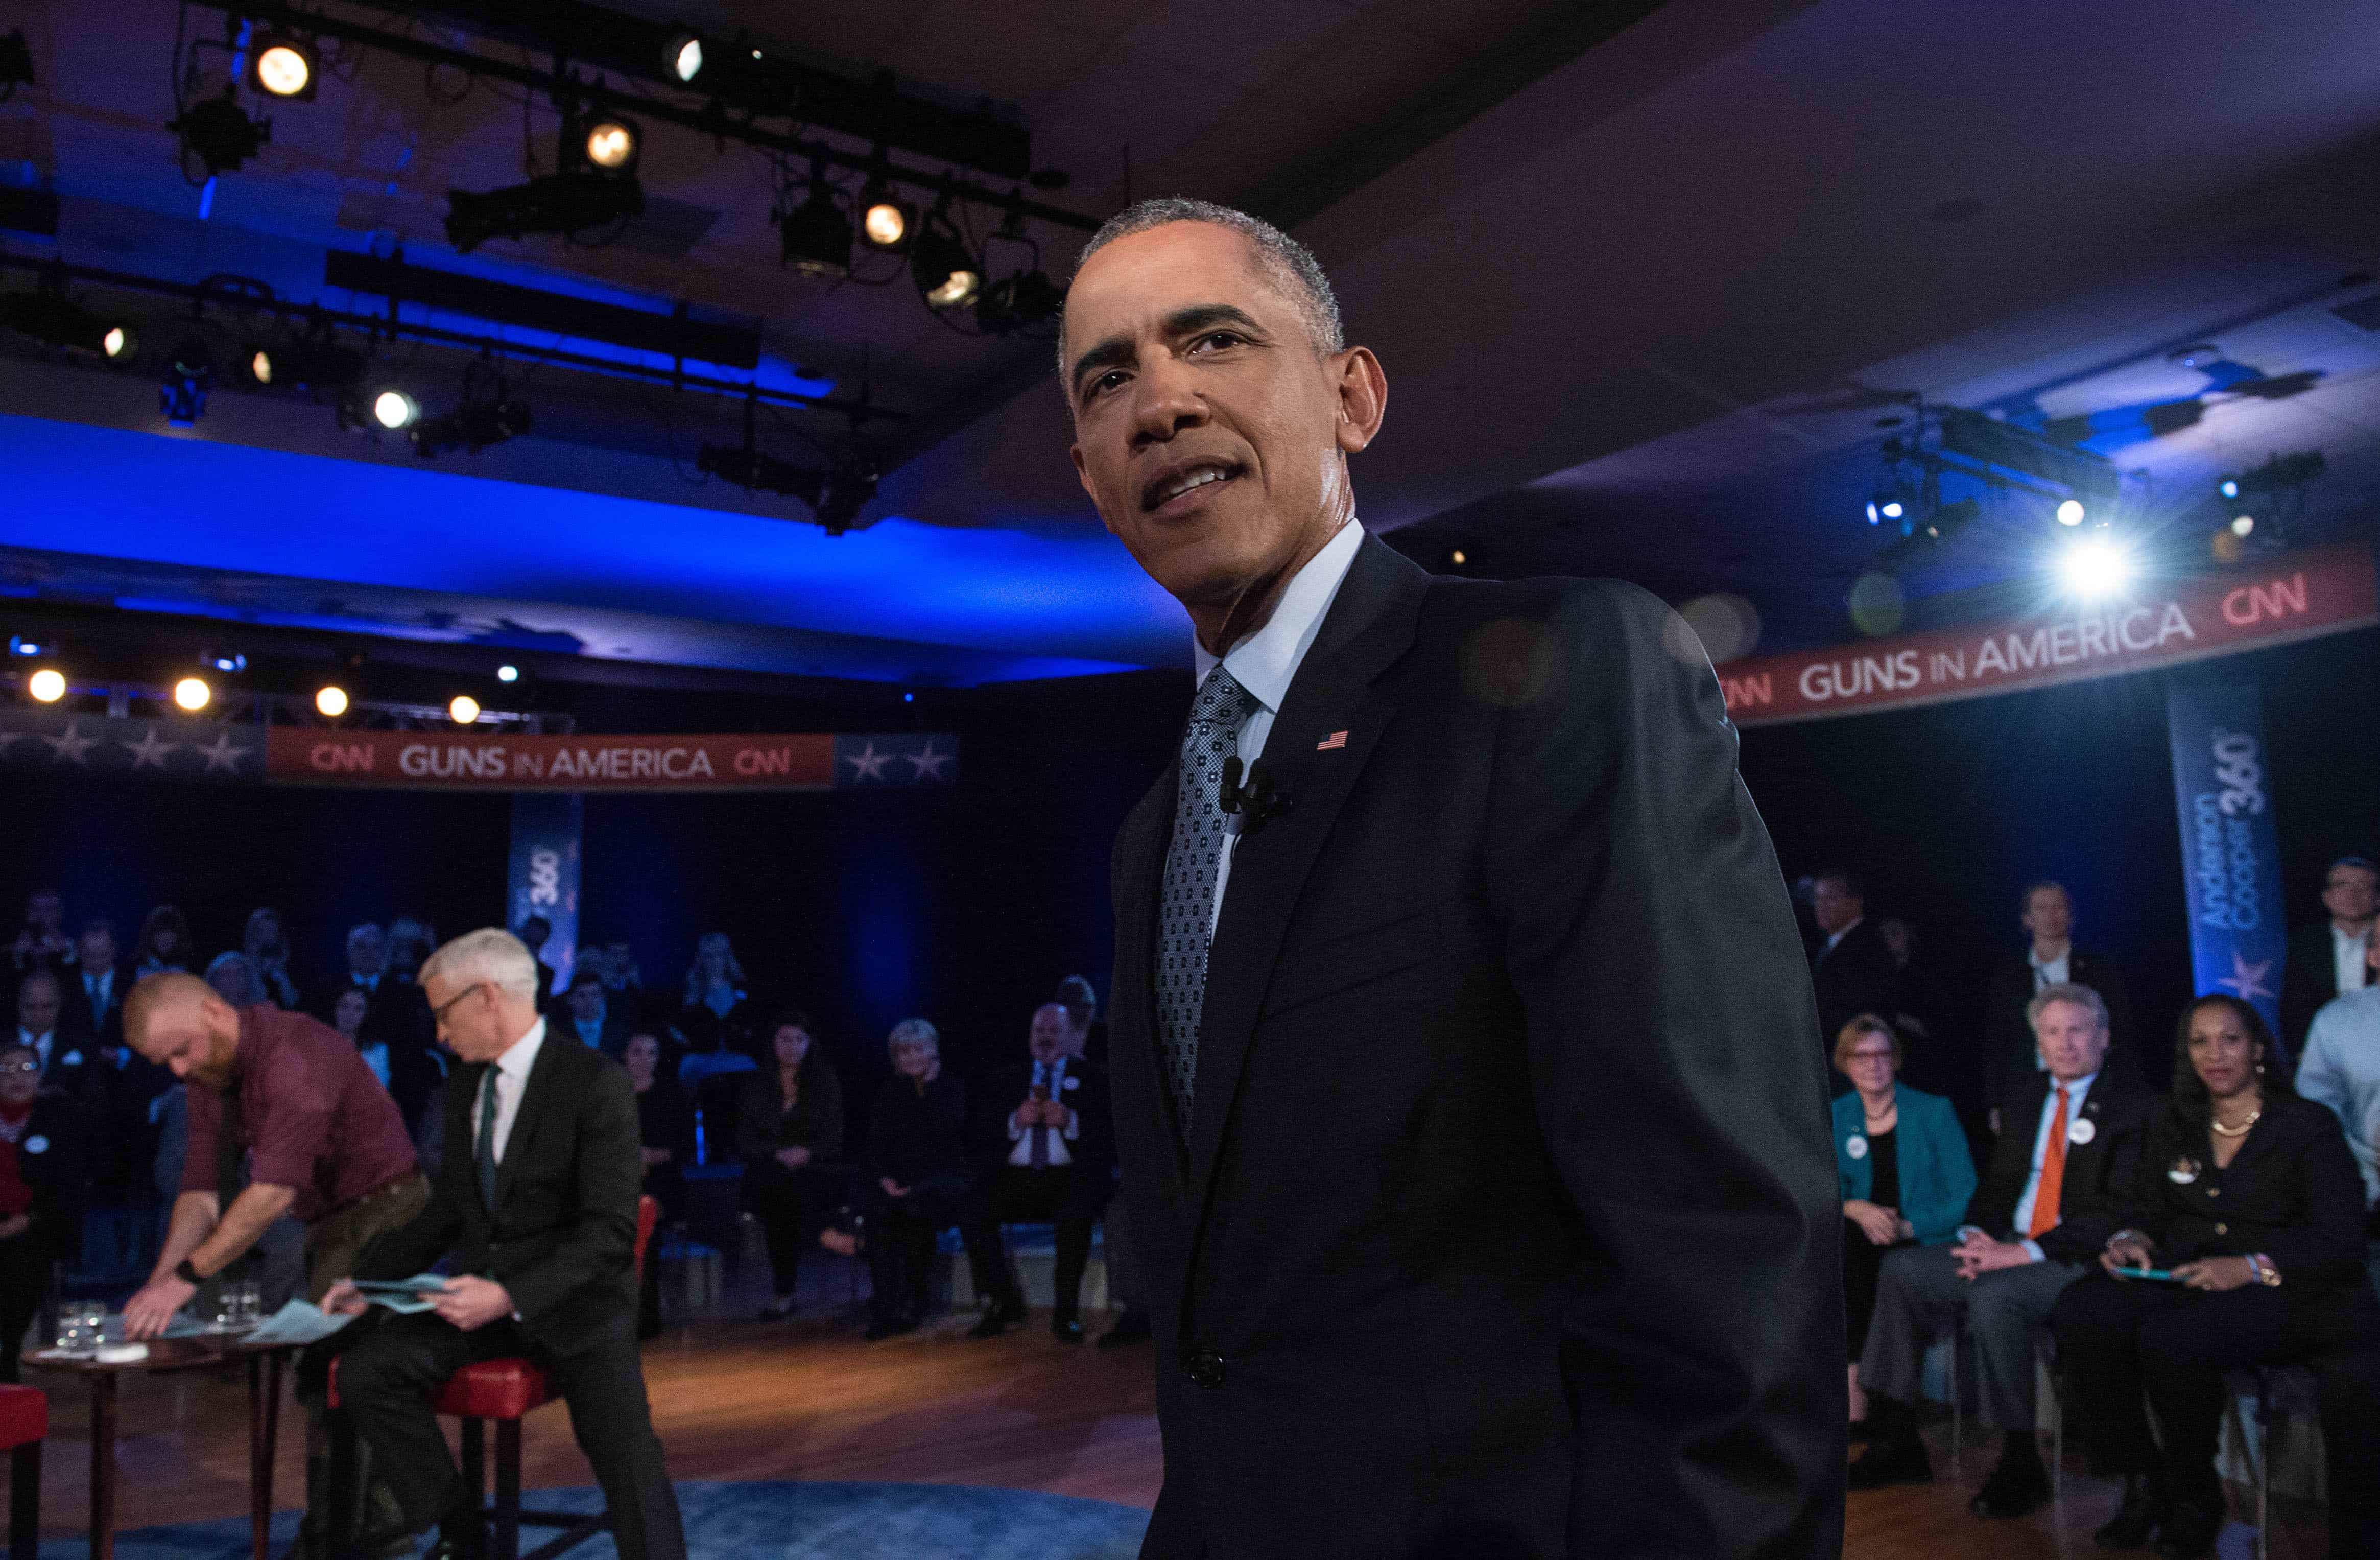 US President Barack Obama on gun control